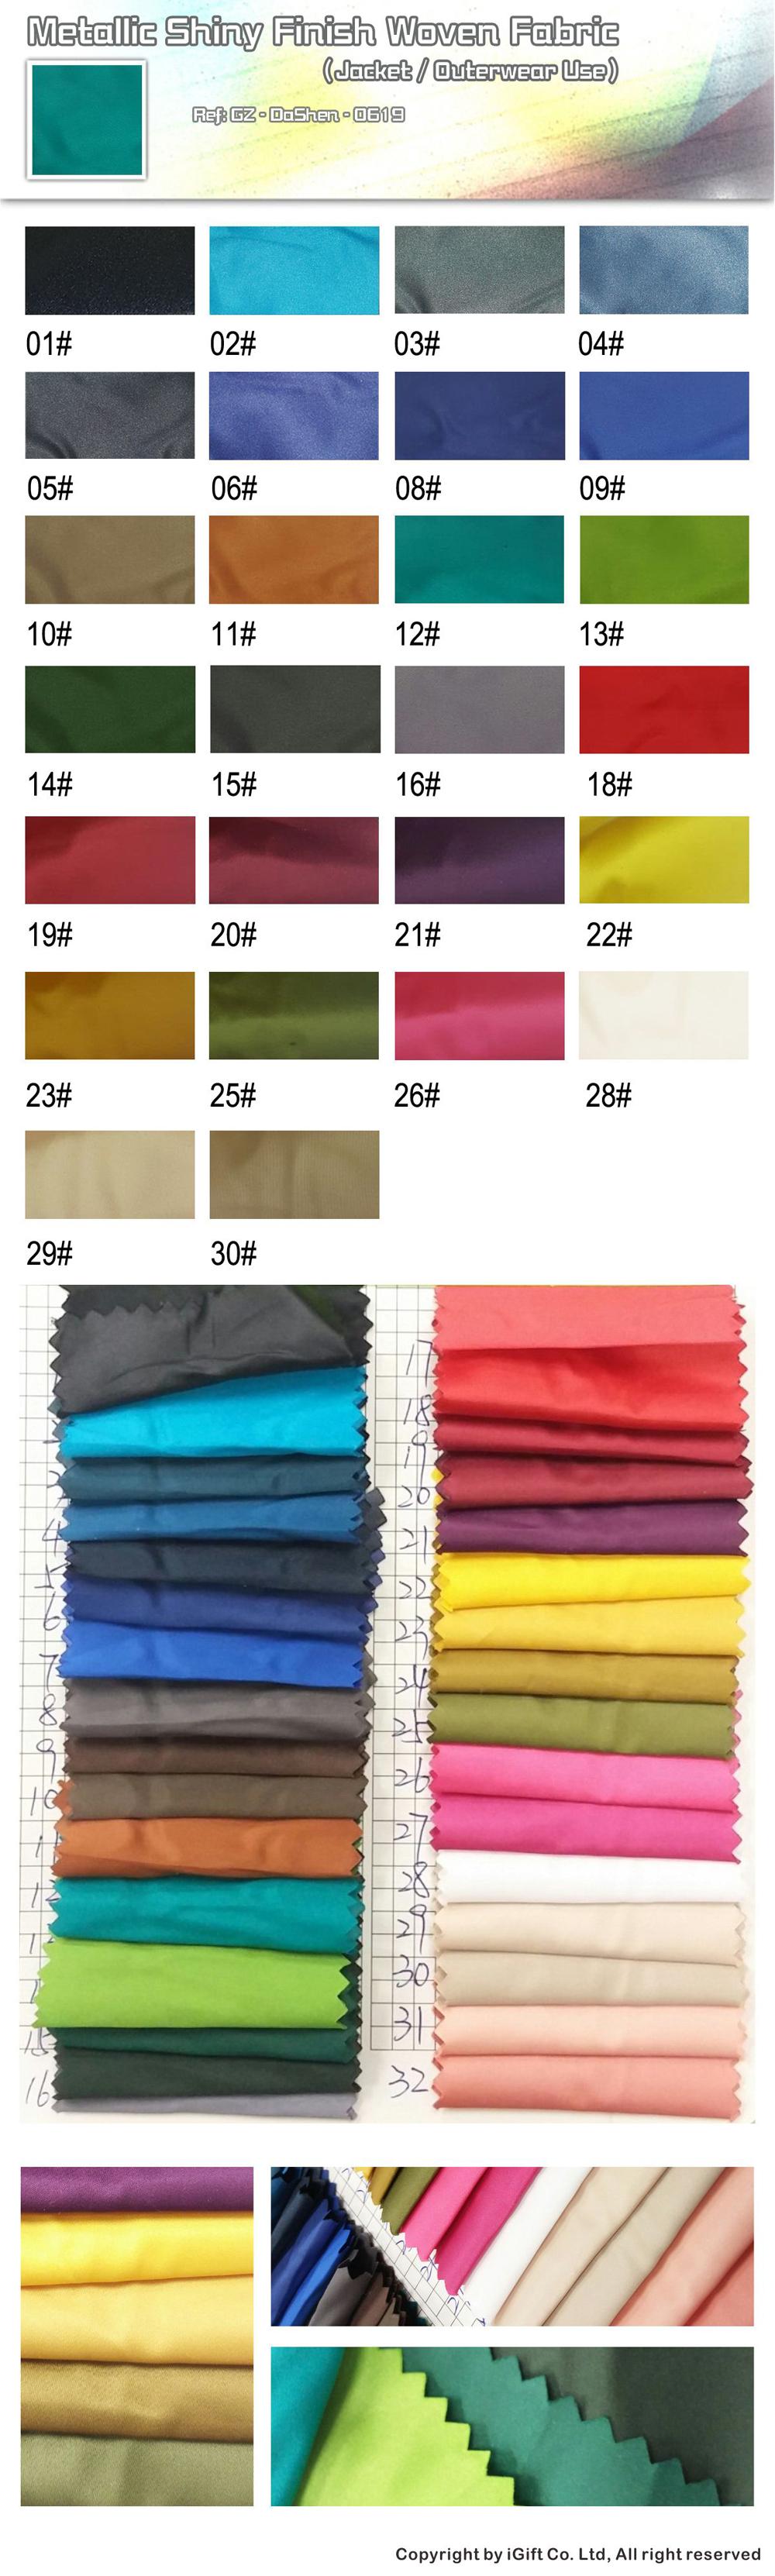 MetallicShiny Finish Woven Fabric 0619